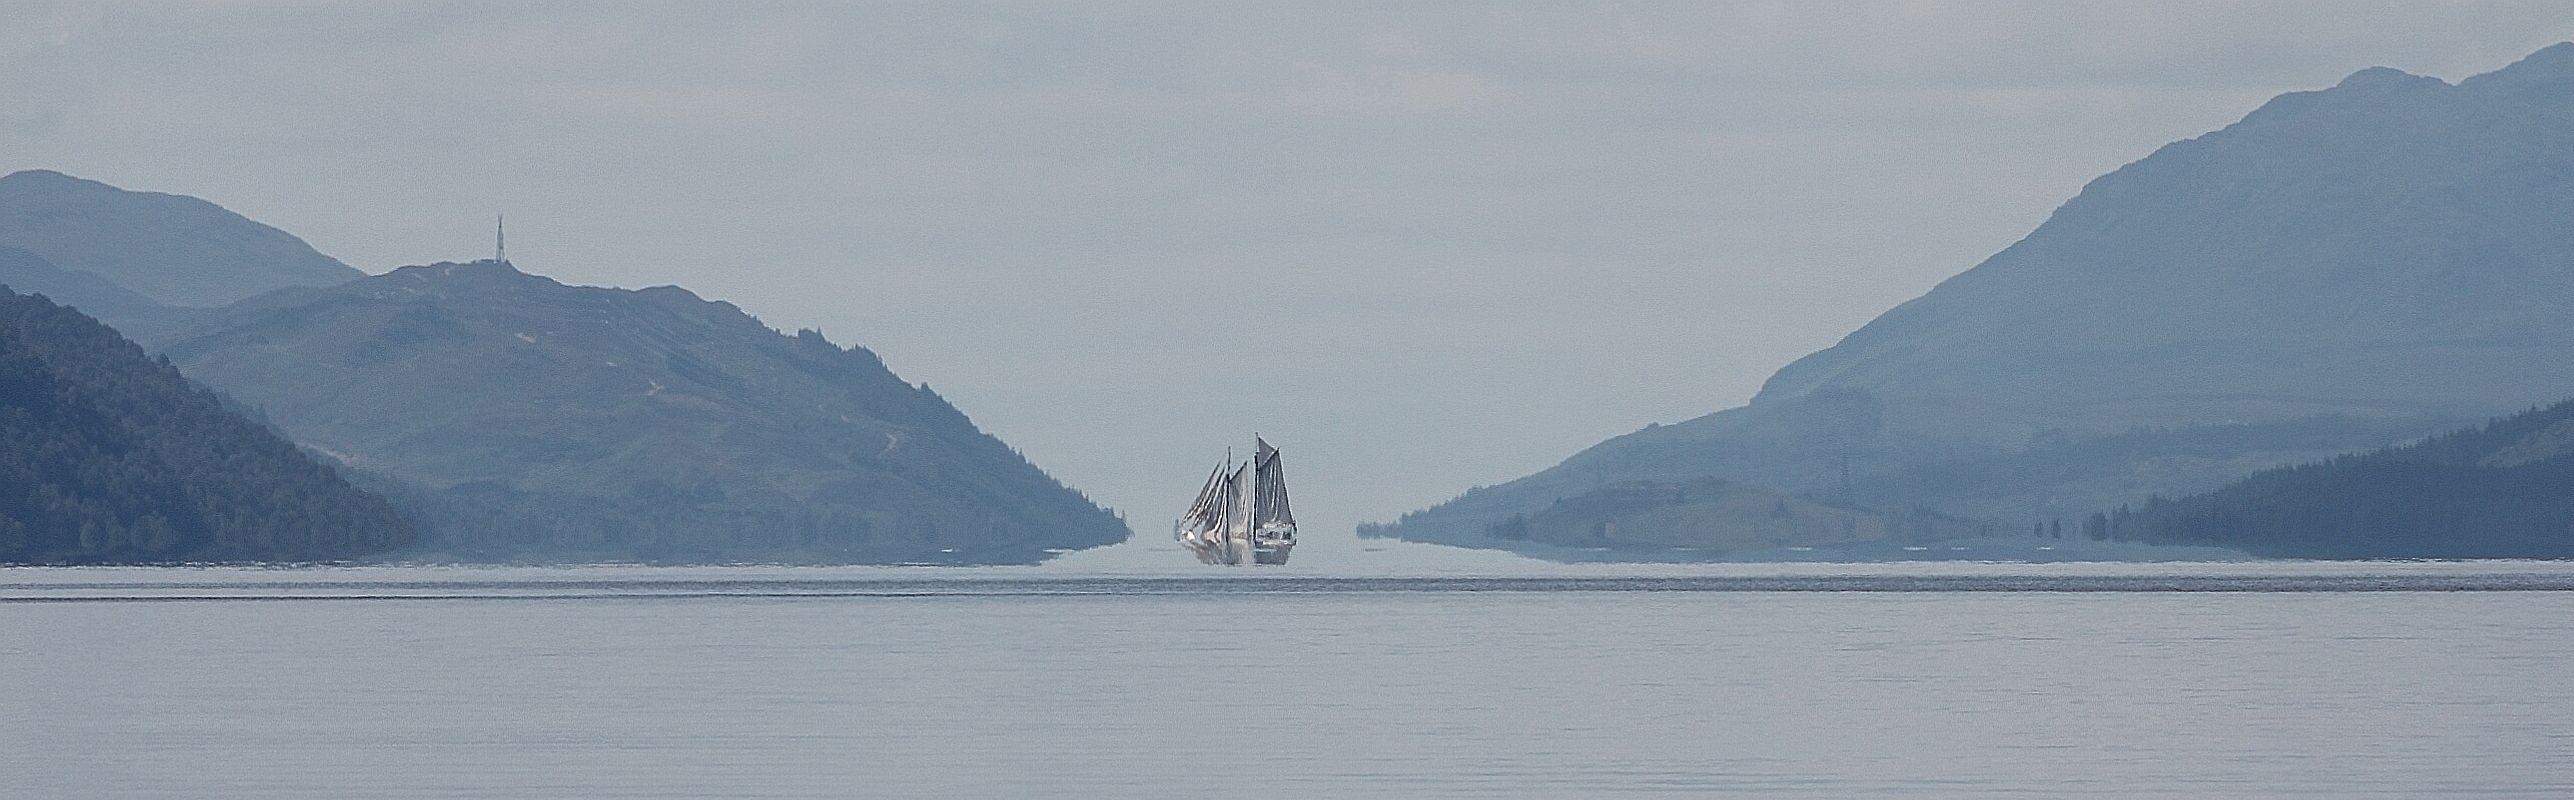 Mirage effect on Loch Ness